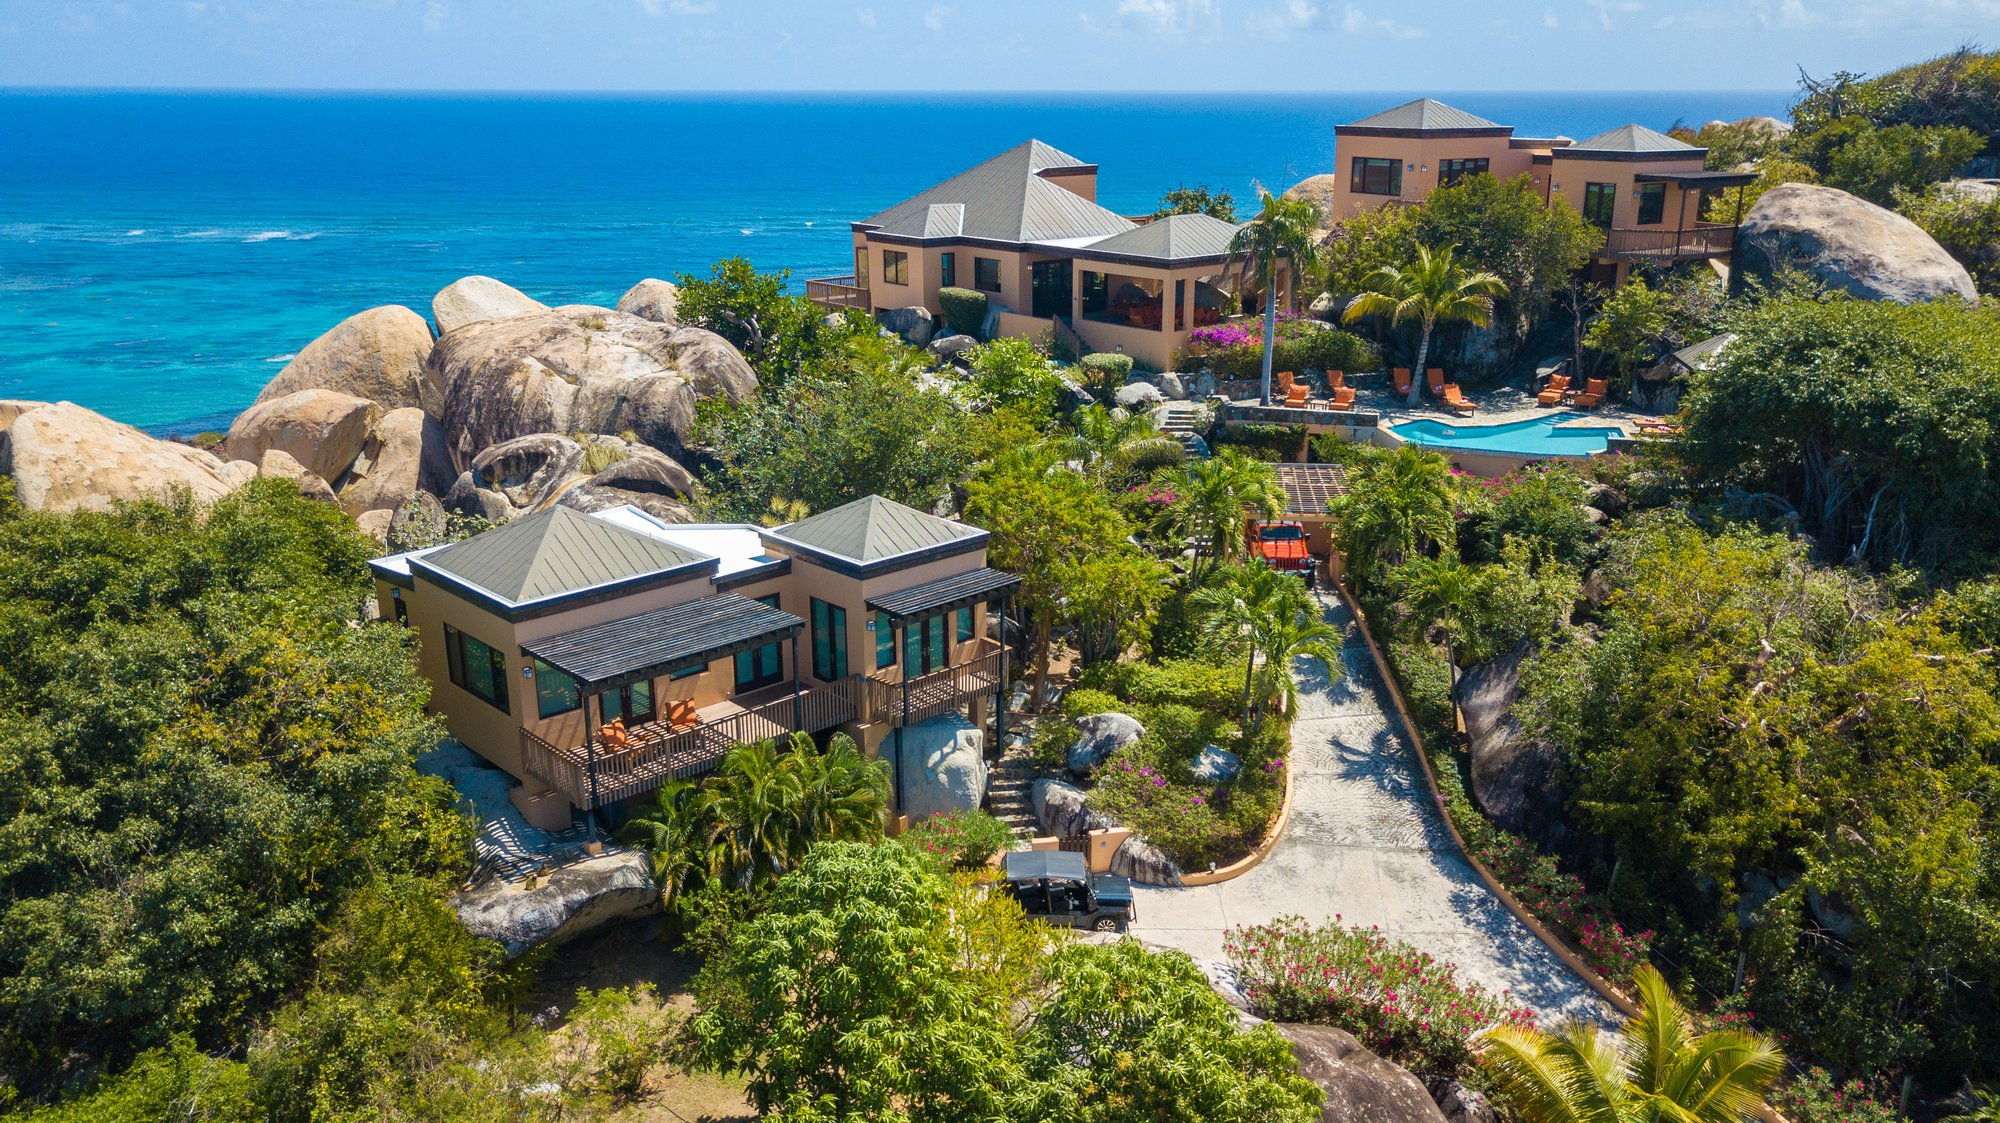 House in Spanish Town, Virgin Gorda, British Virgin Islands 1 - 11307763